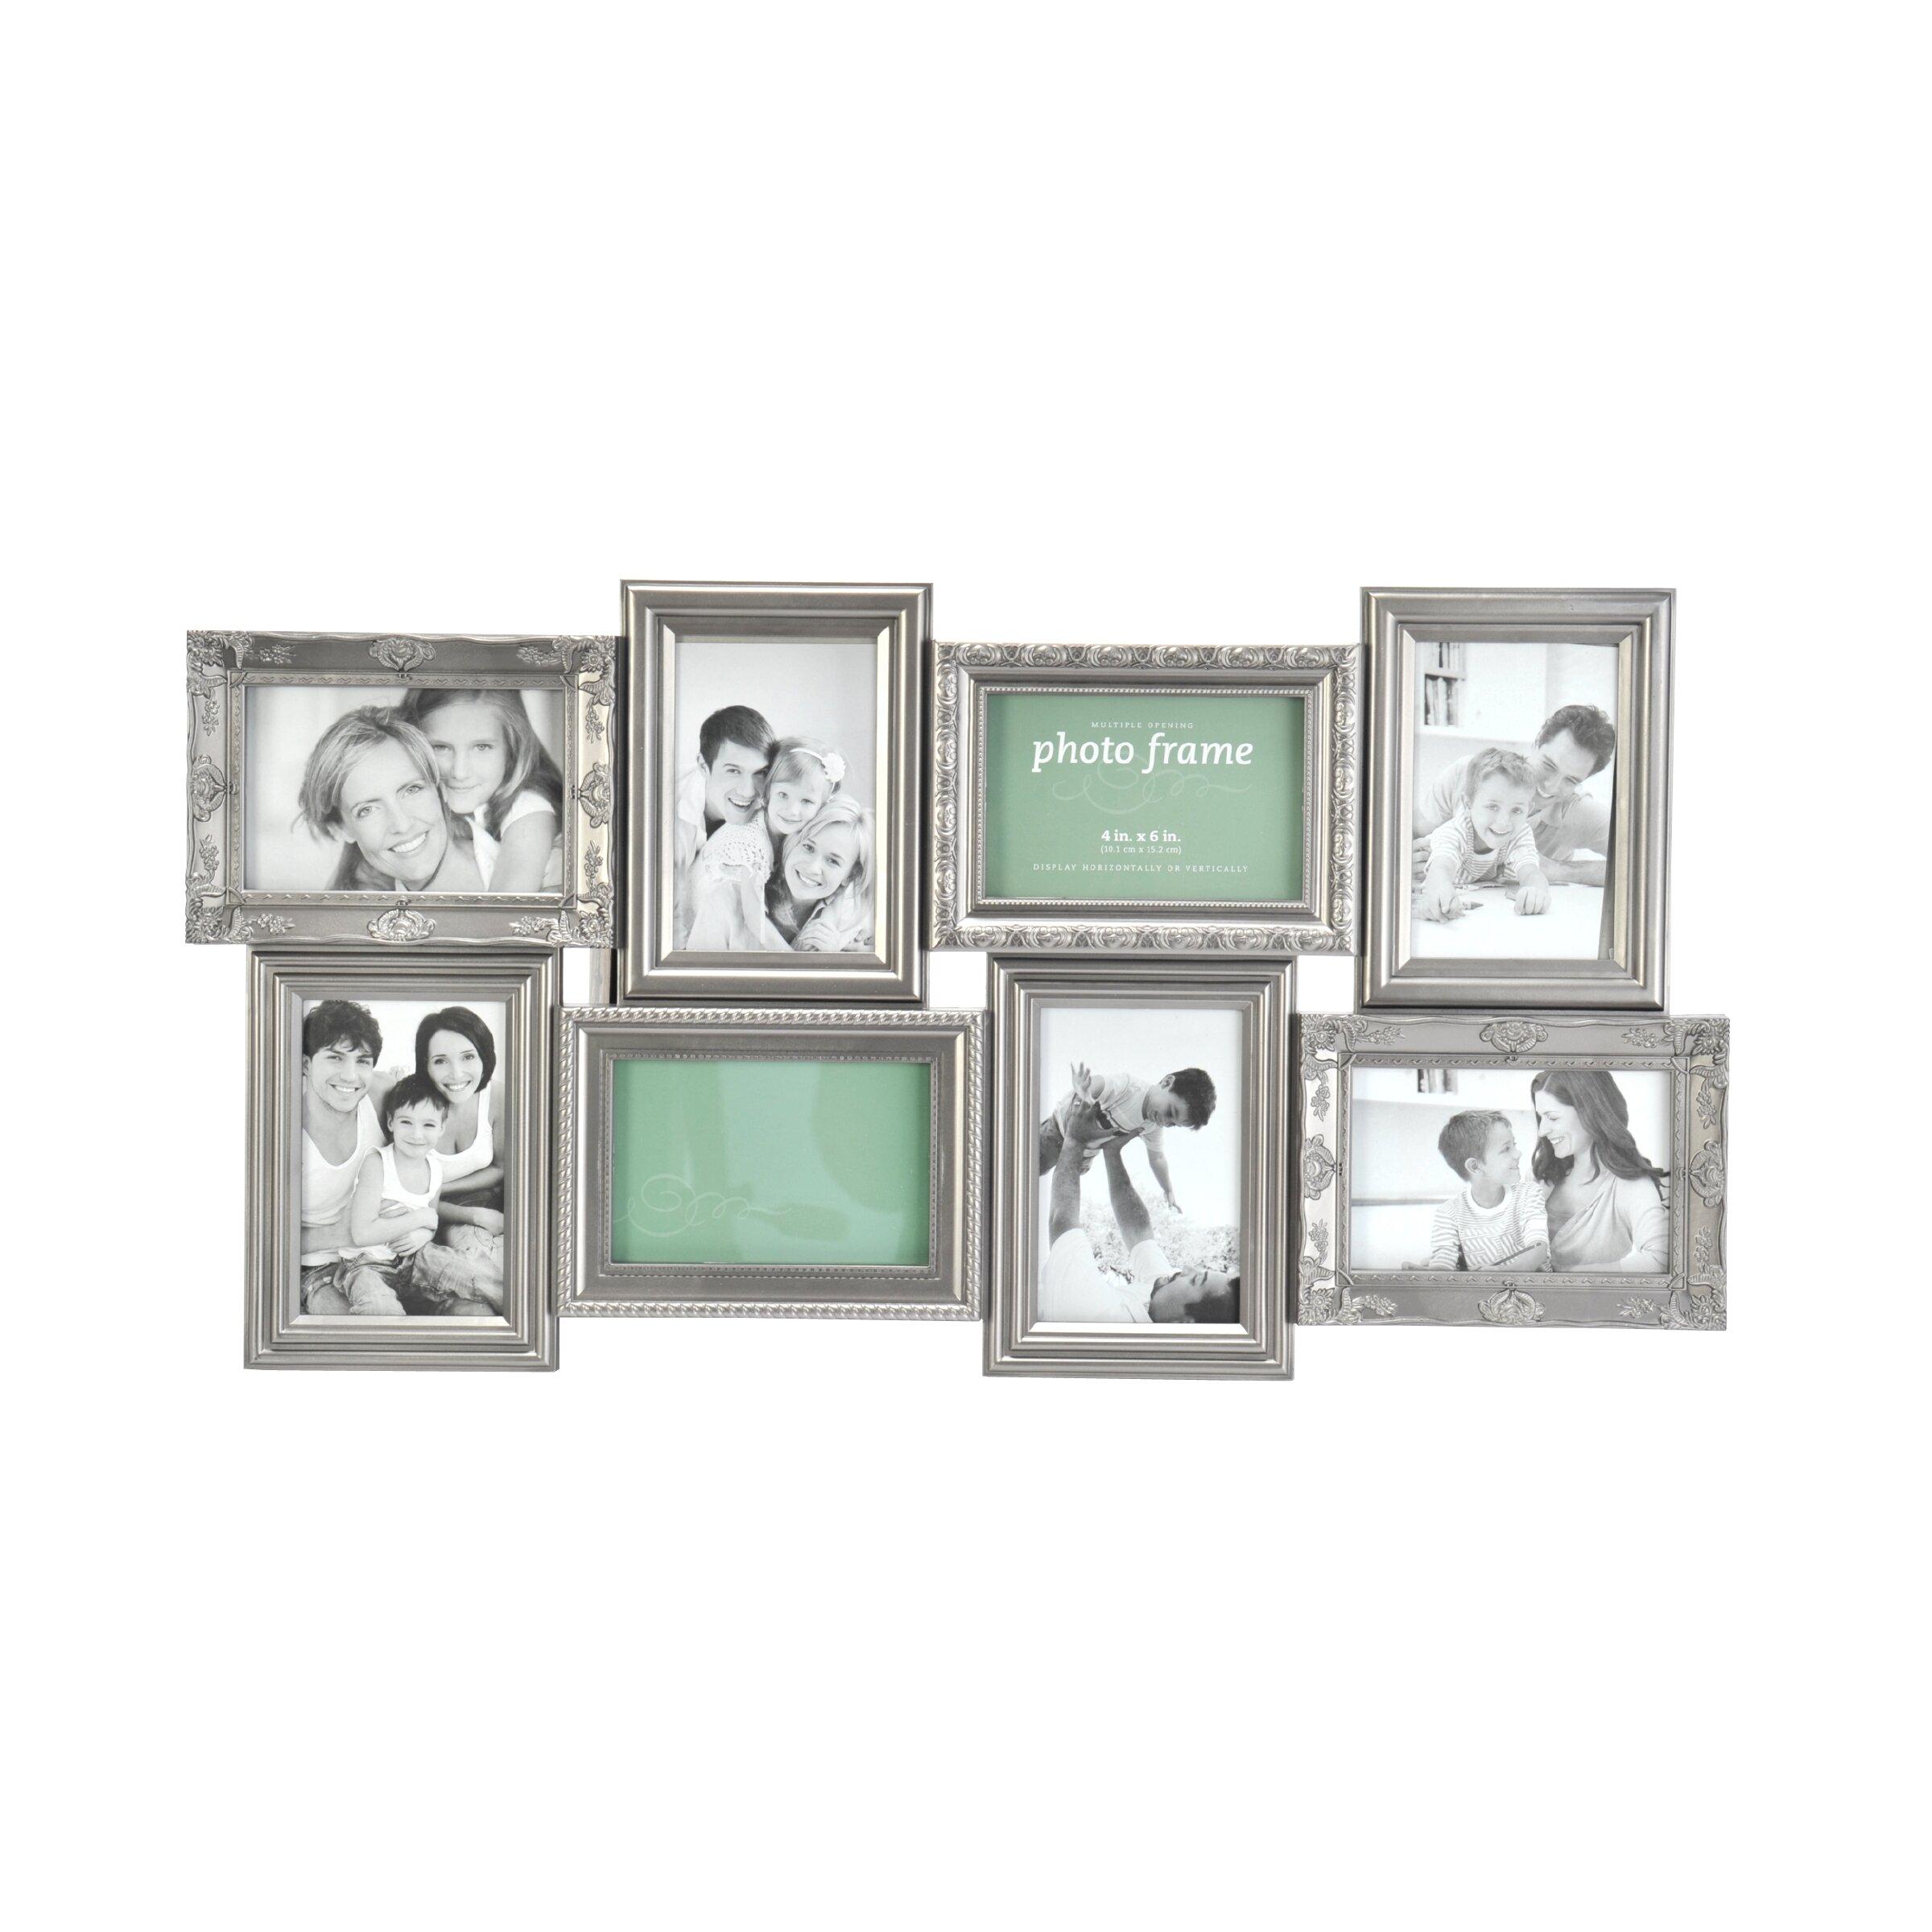 melannco 8 opening multi profile collage picture frame reviews wayfair. Black Bedroom Furniture Sets. Home Design Ideas